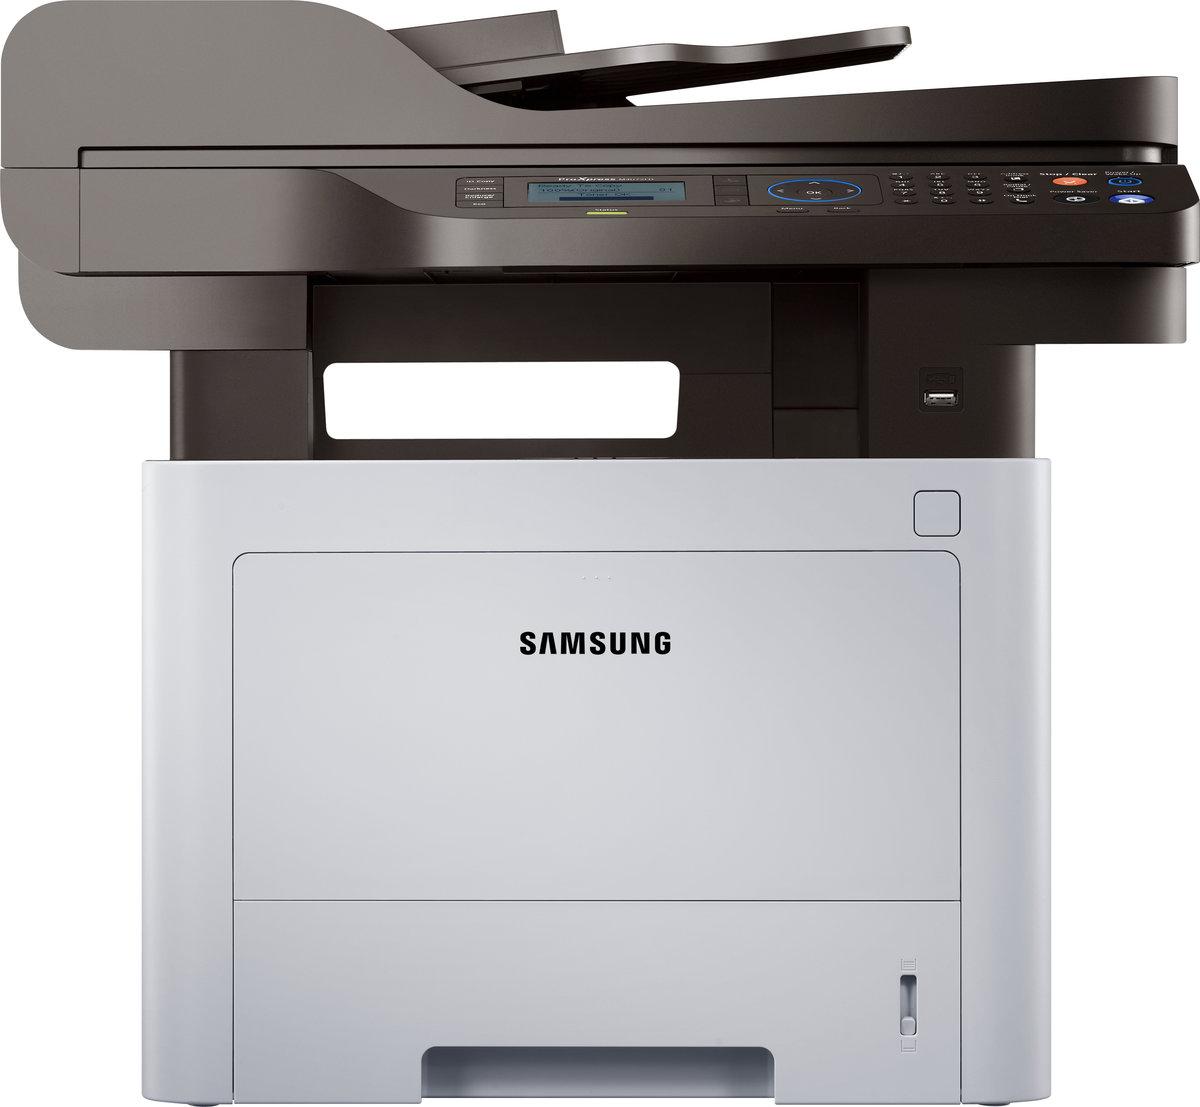 slide 1 of 3,show larger image, impresora láser multifunción samsung proxpress sl-m4072fd